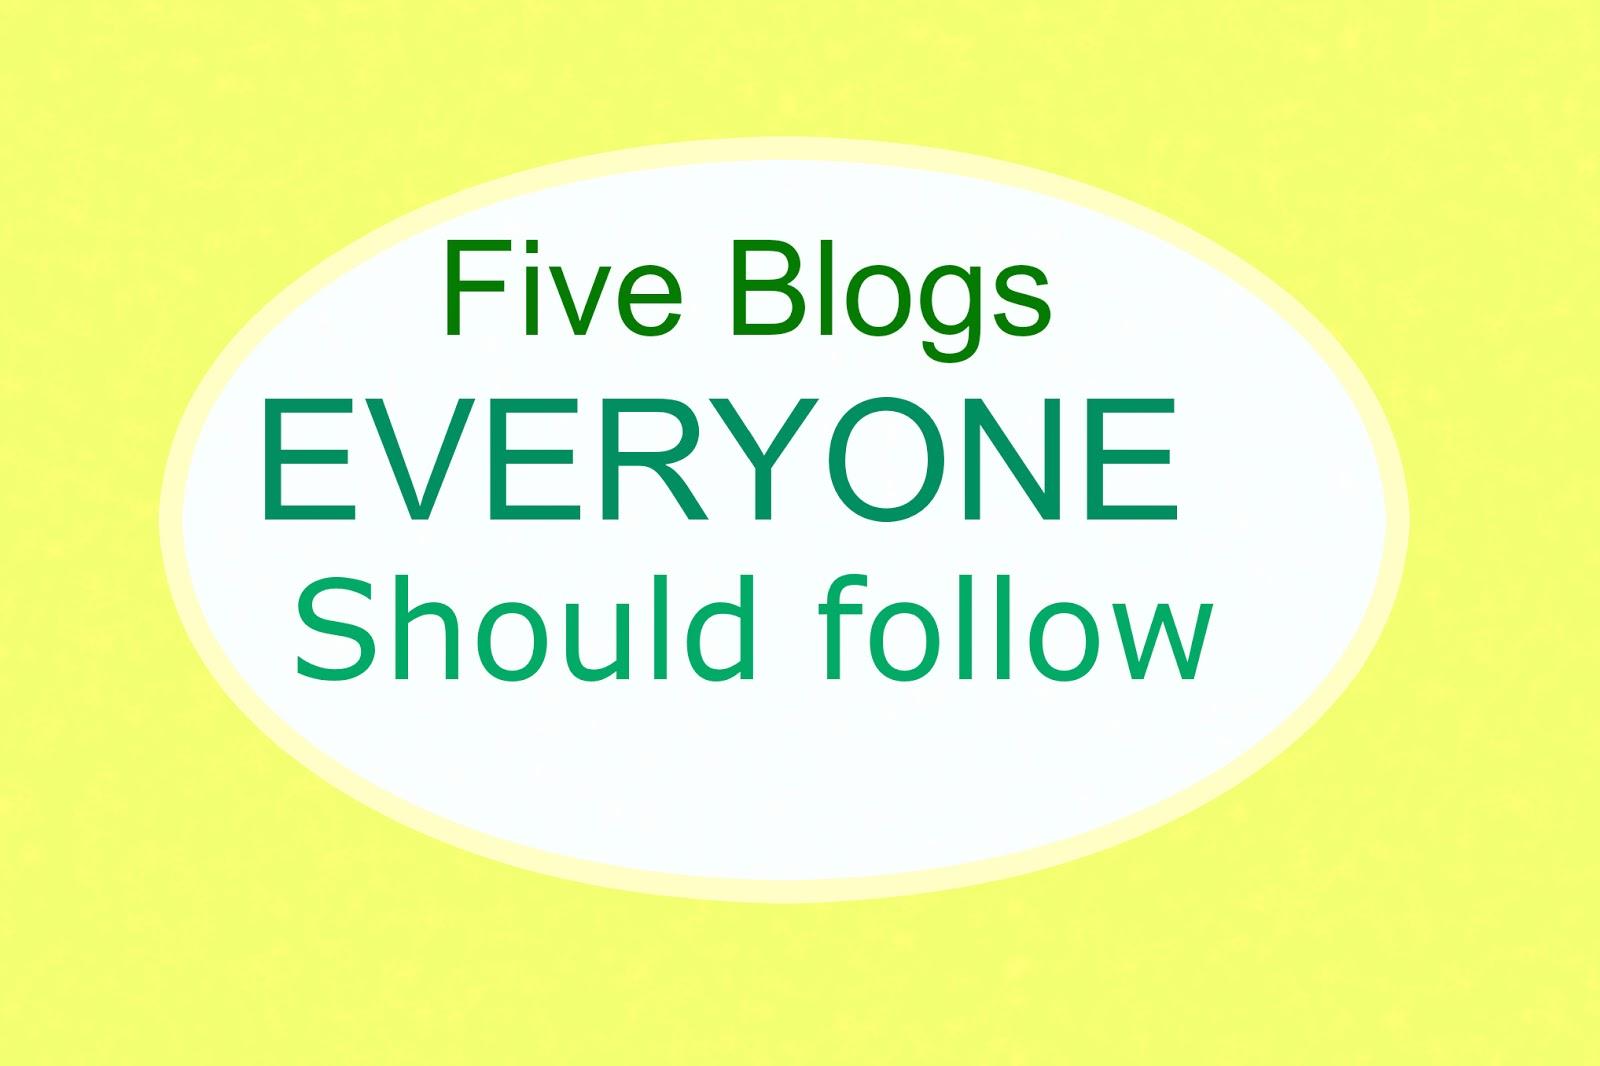 Five Blogs Everyone Should Follow